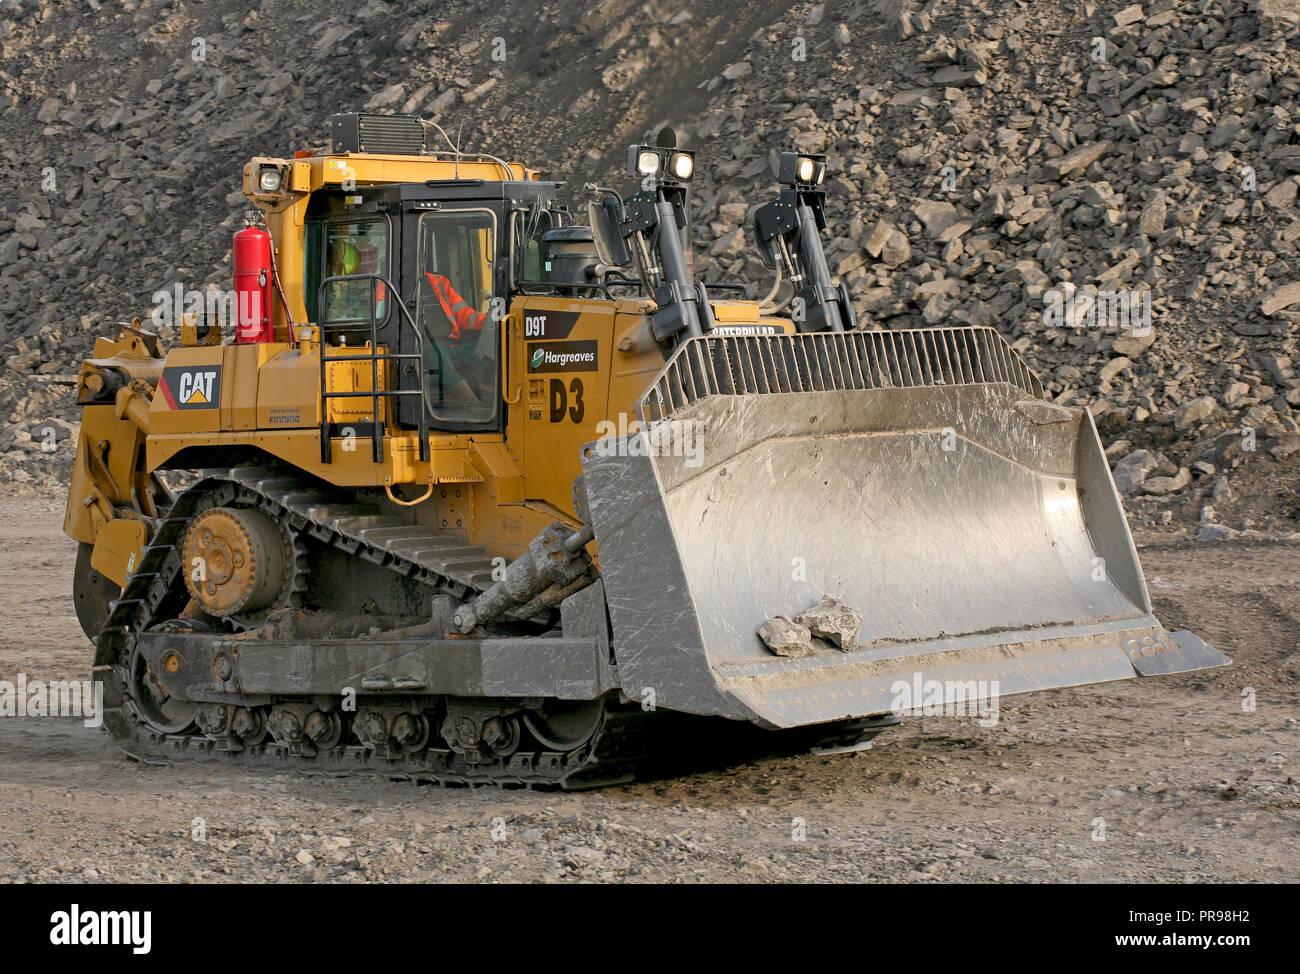 Caterpillar D9T Bulldozer Working at Tower Colliery open